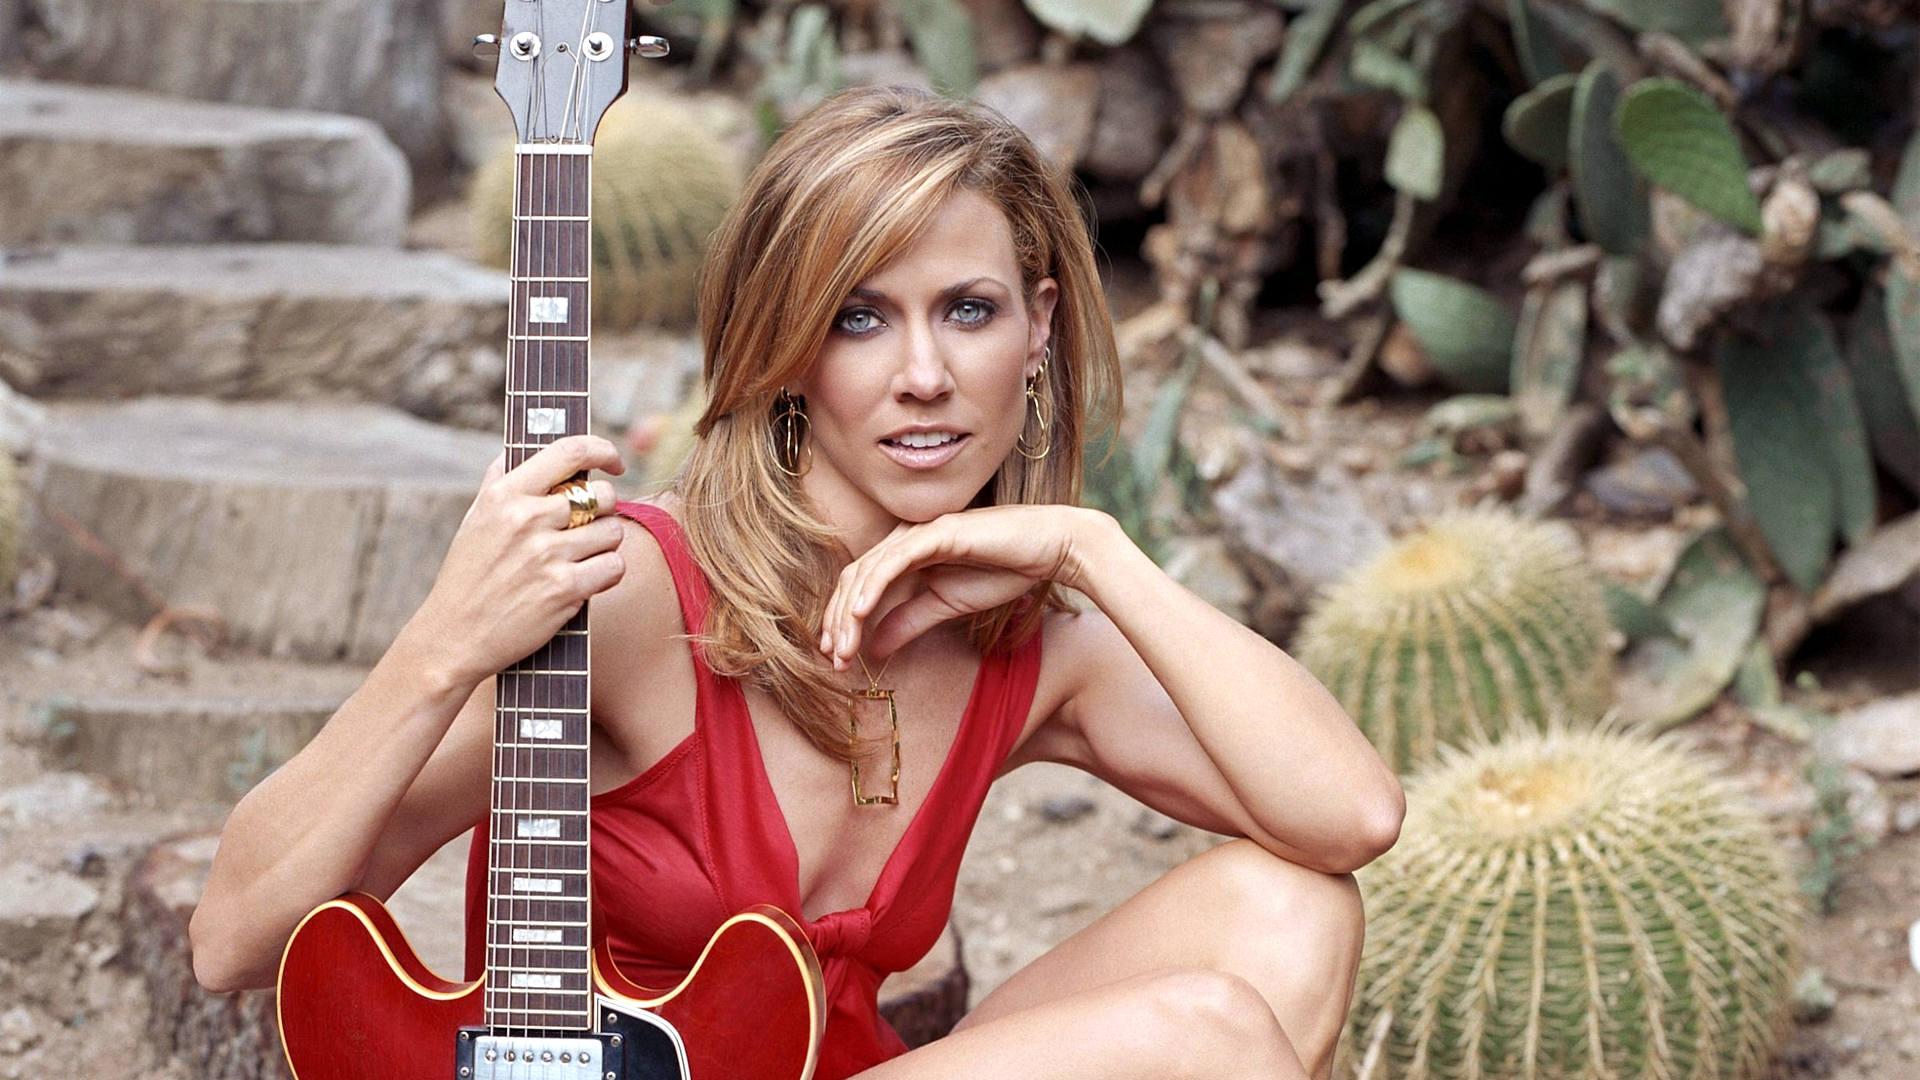 Country Music Stars Wallpaper: Sheryl Crow HD Wallpaper